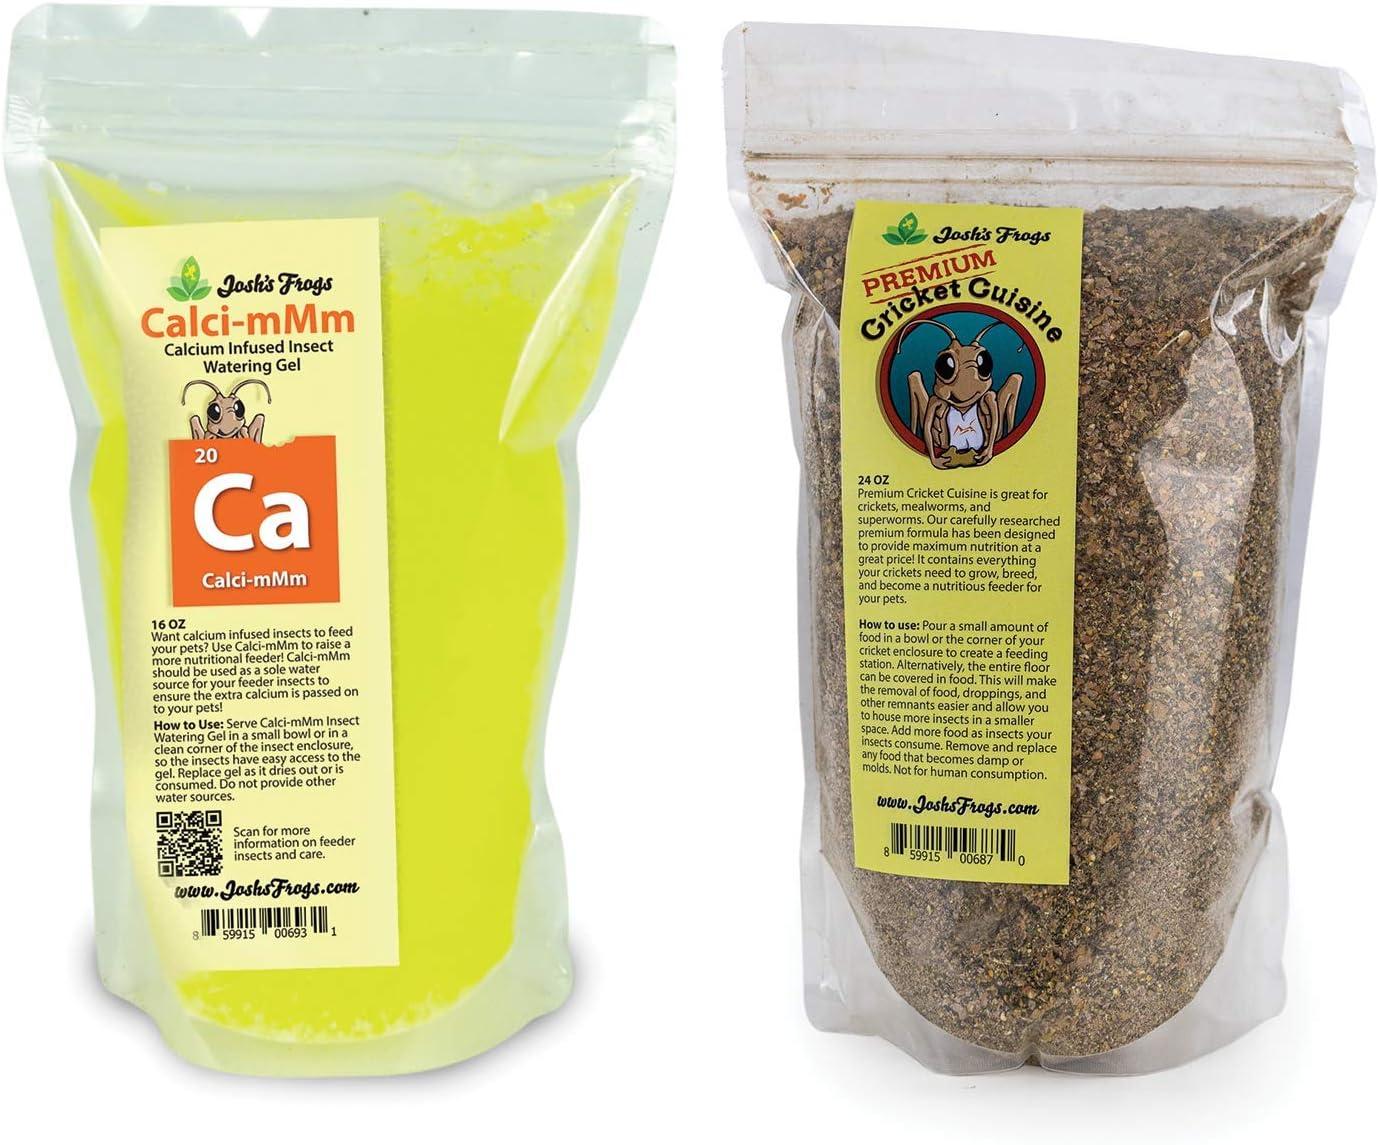 Josh's Frogs Premium Cricket Cuisine and Calcium Watering Gel Bundle (24 oz and 16 oz)